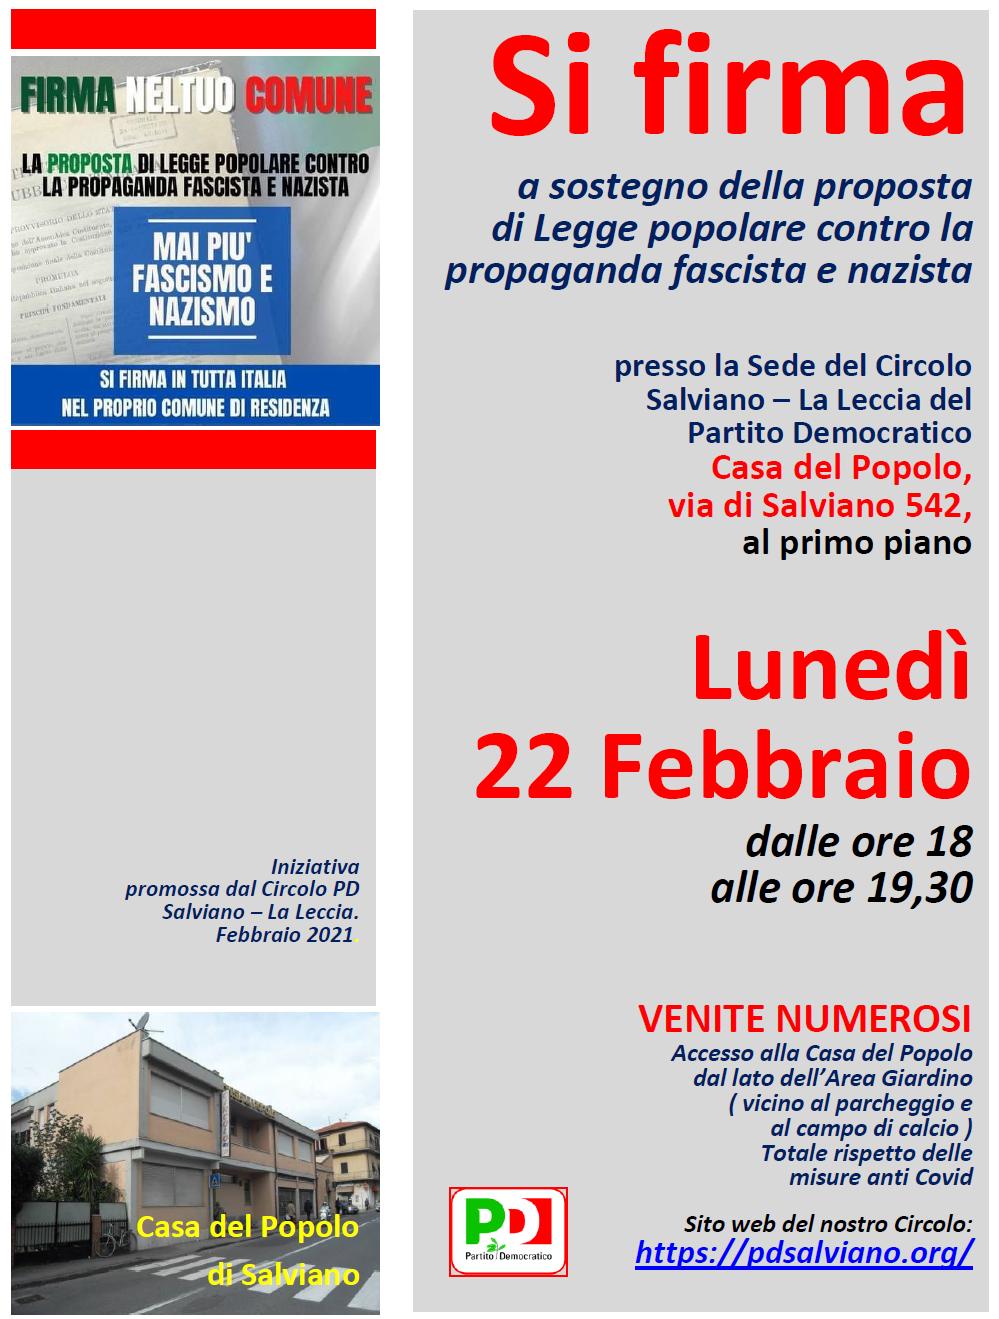 Firme antifasciste a Salviano. Lunedì 22 Febbraio 2021.